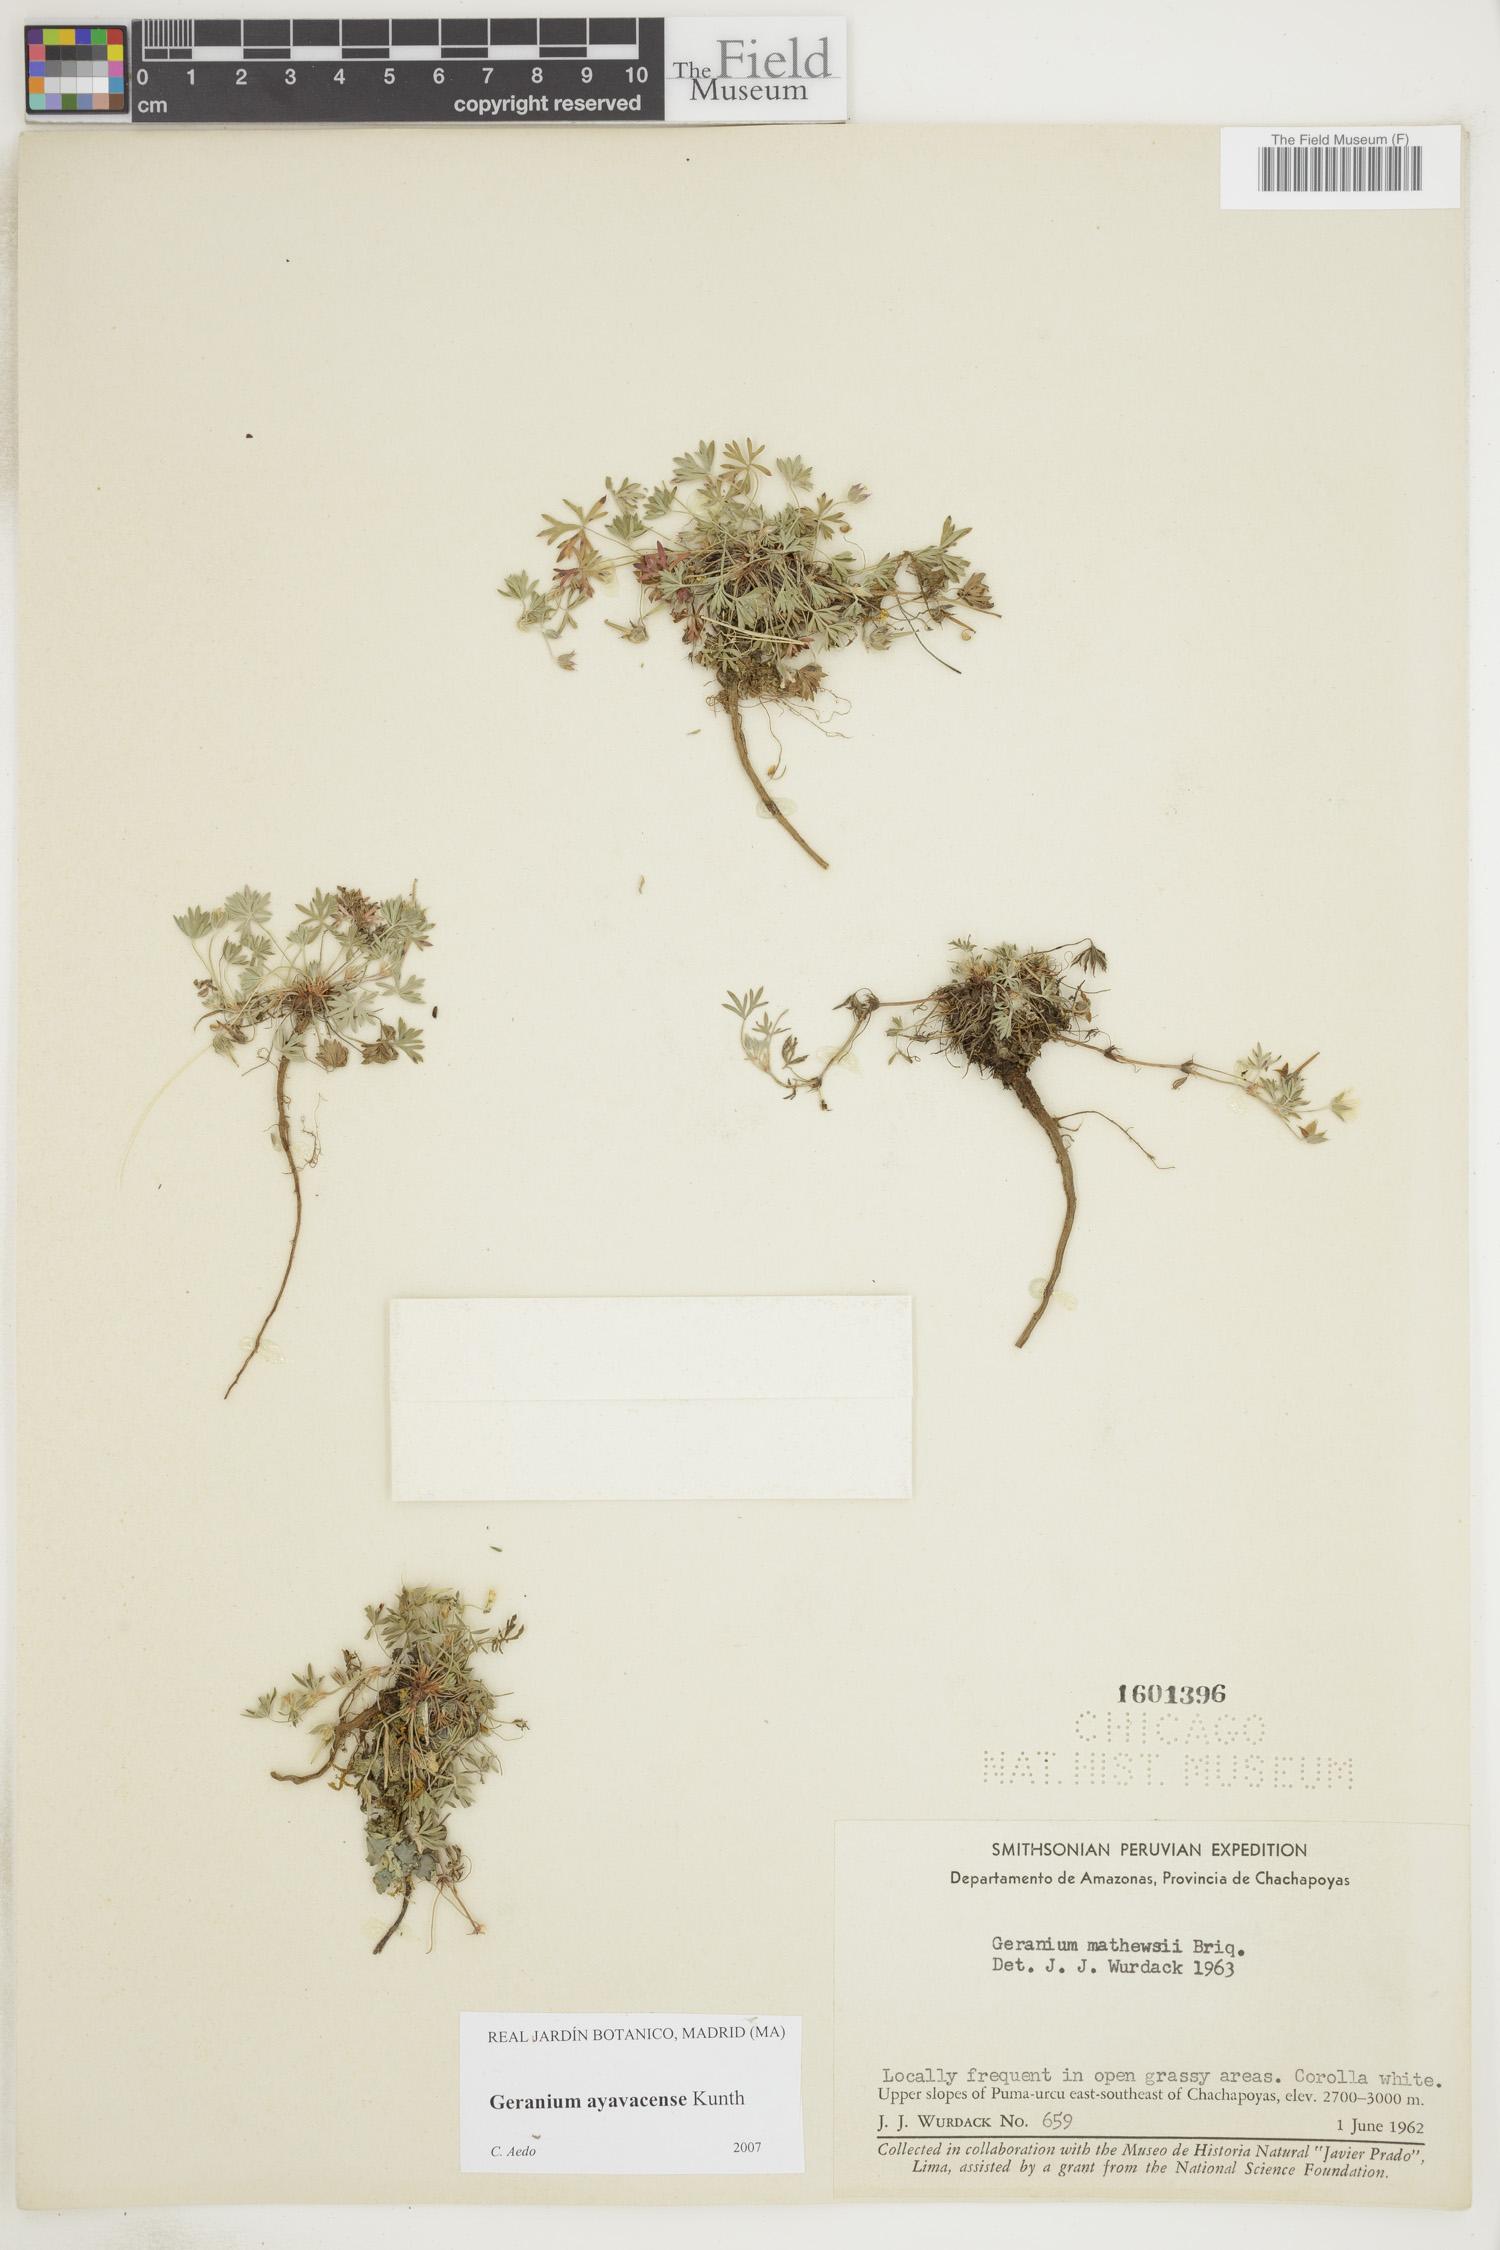 Geranium ayavacense image